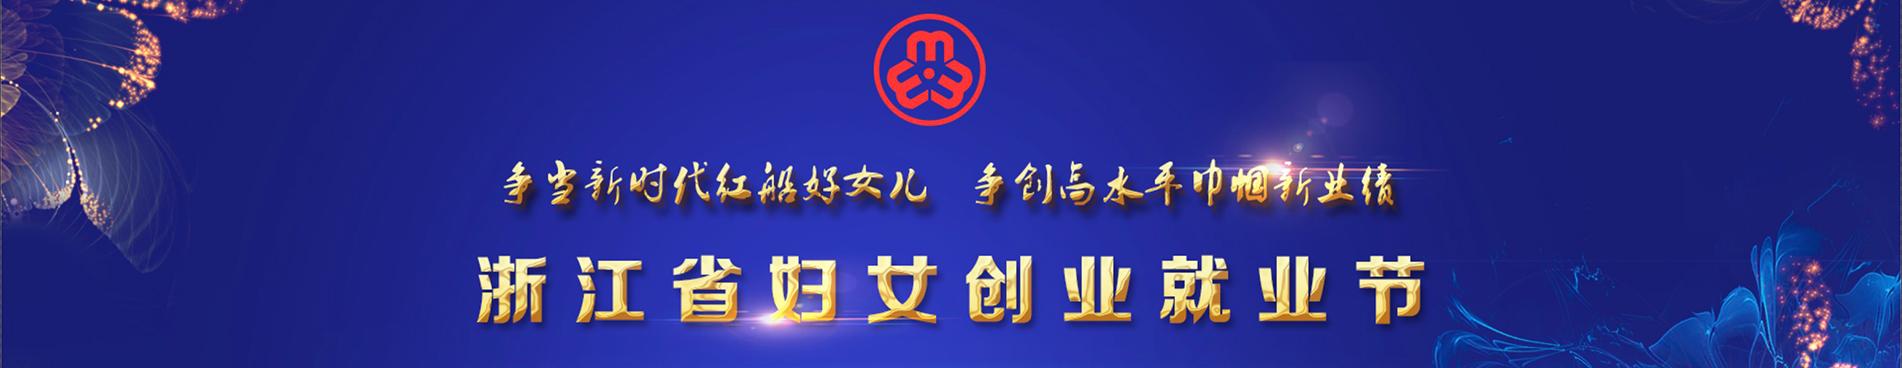 betvip365亞洲版官網創業就抑鄰